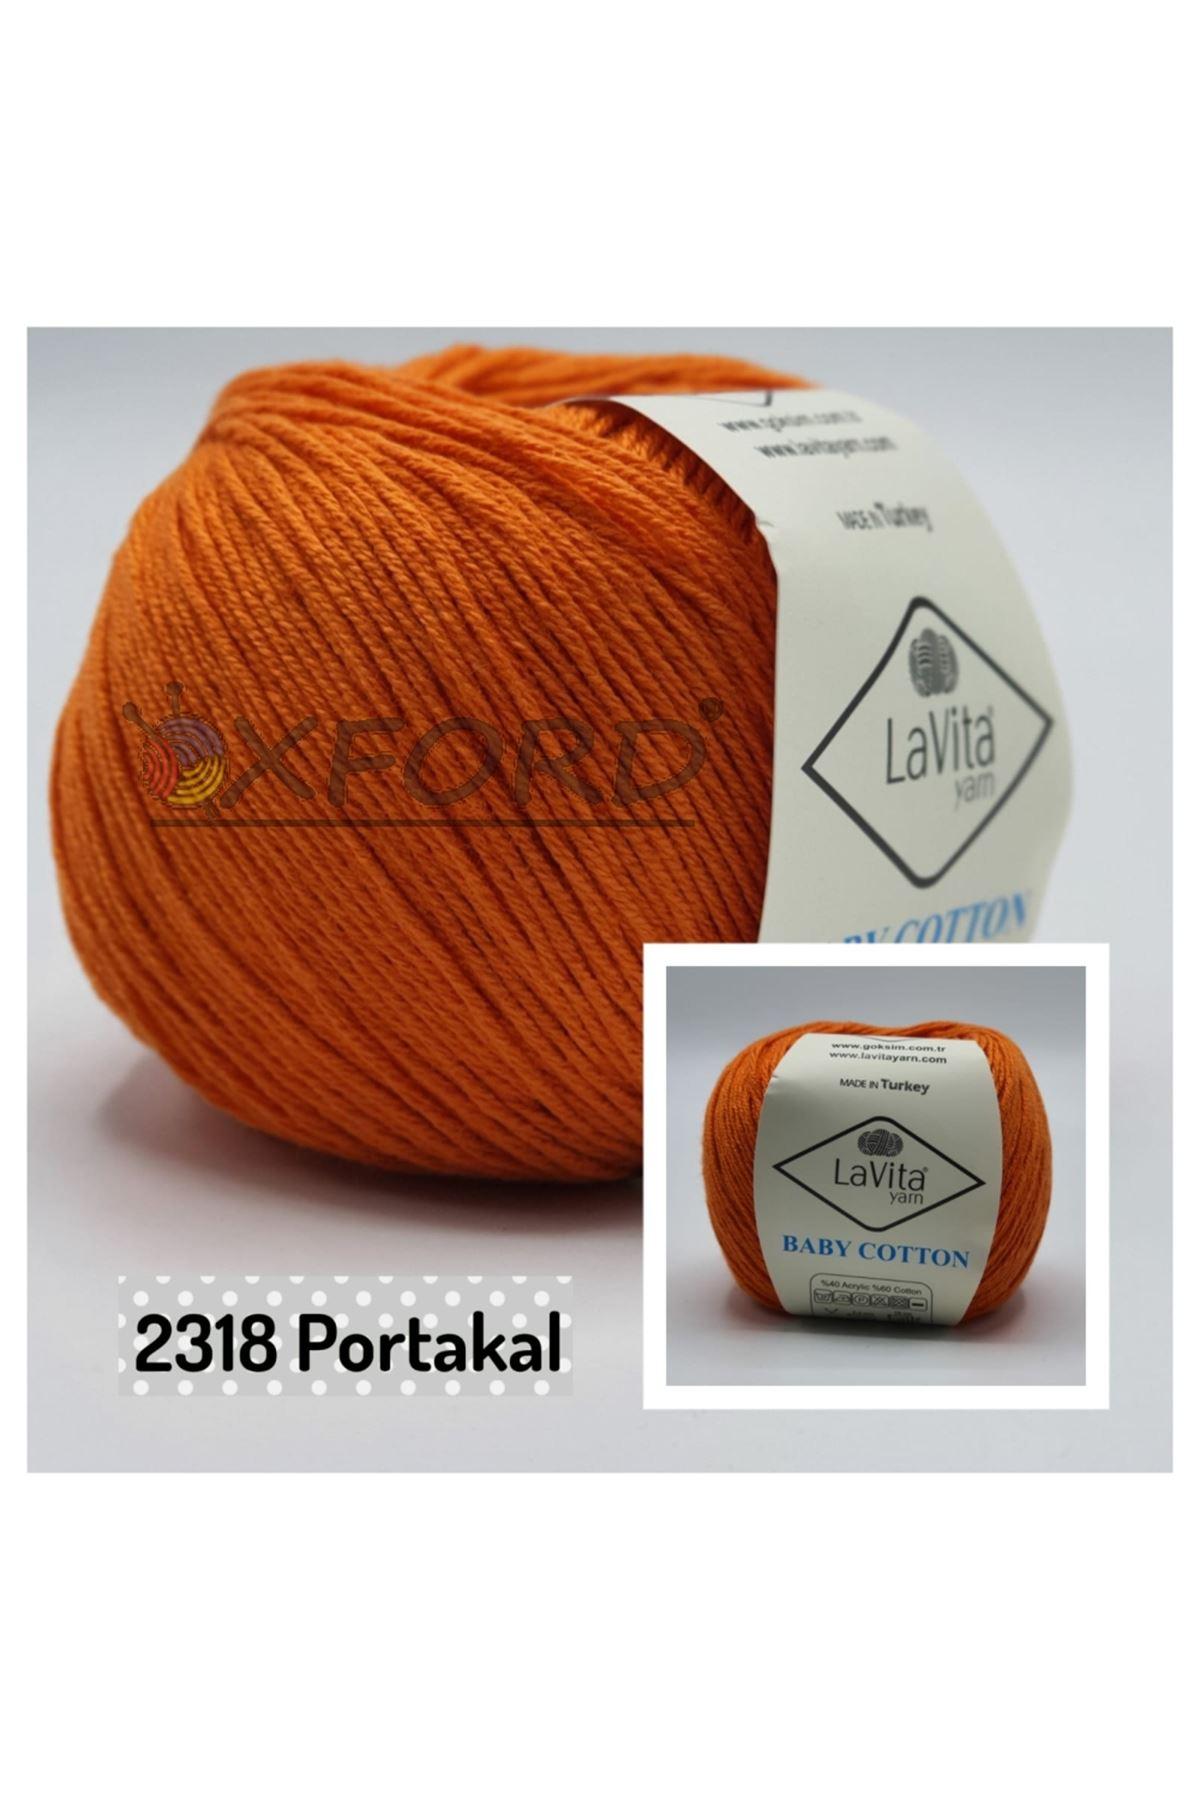 Lavita Baby Cotton 2318 Portakal